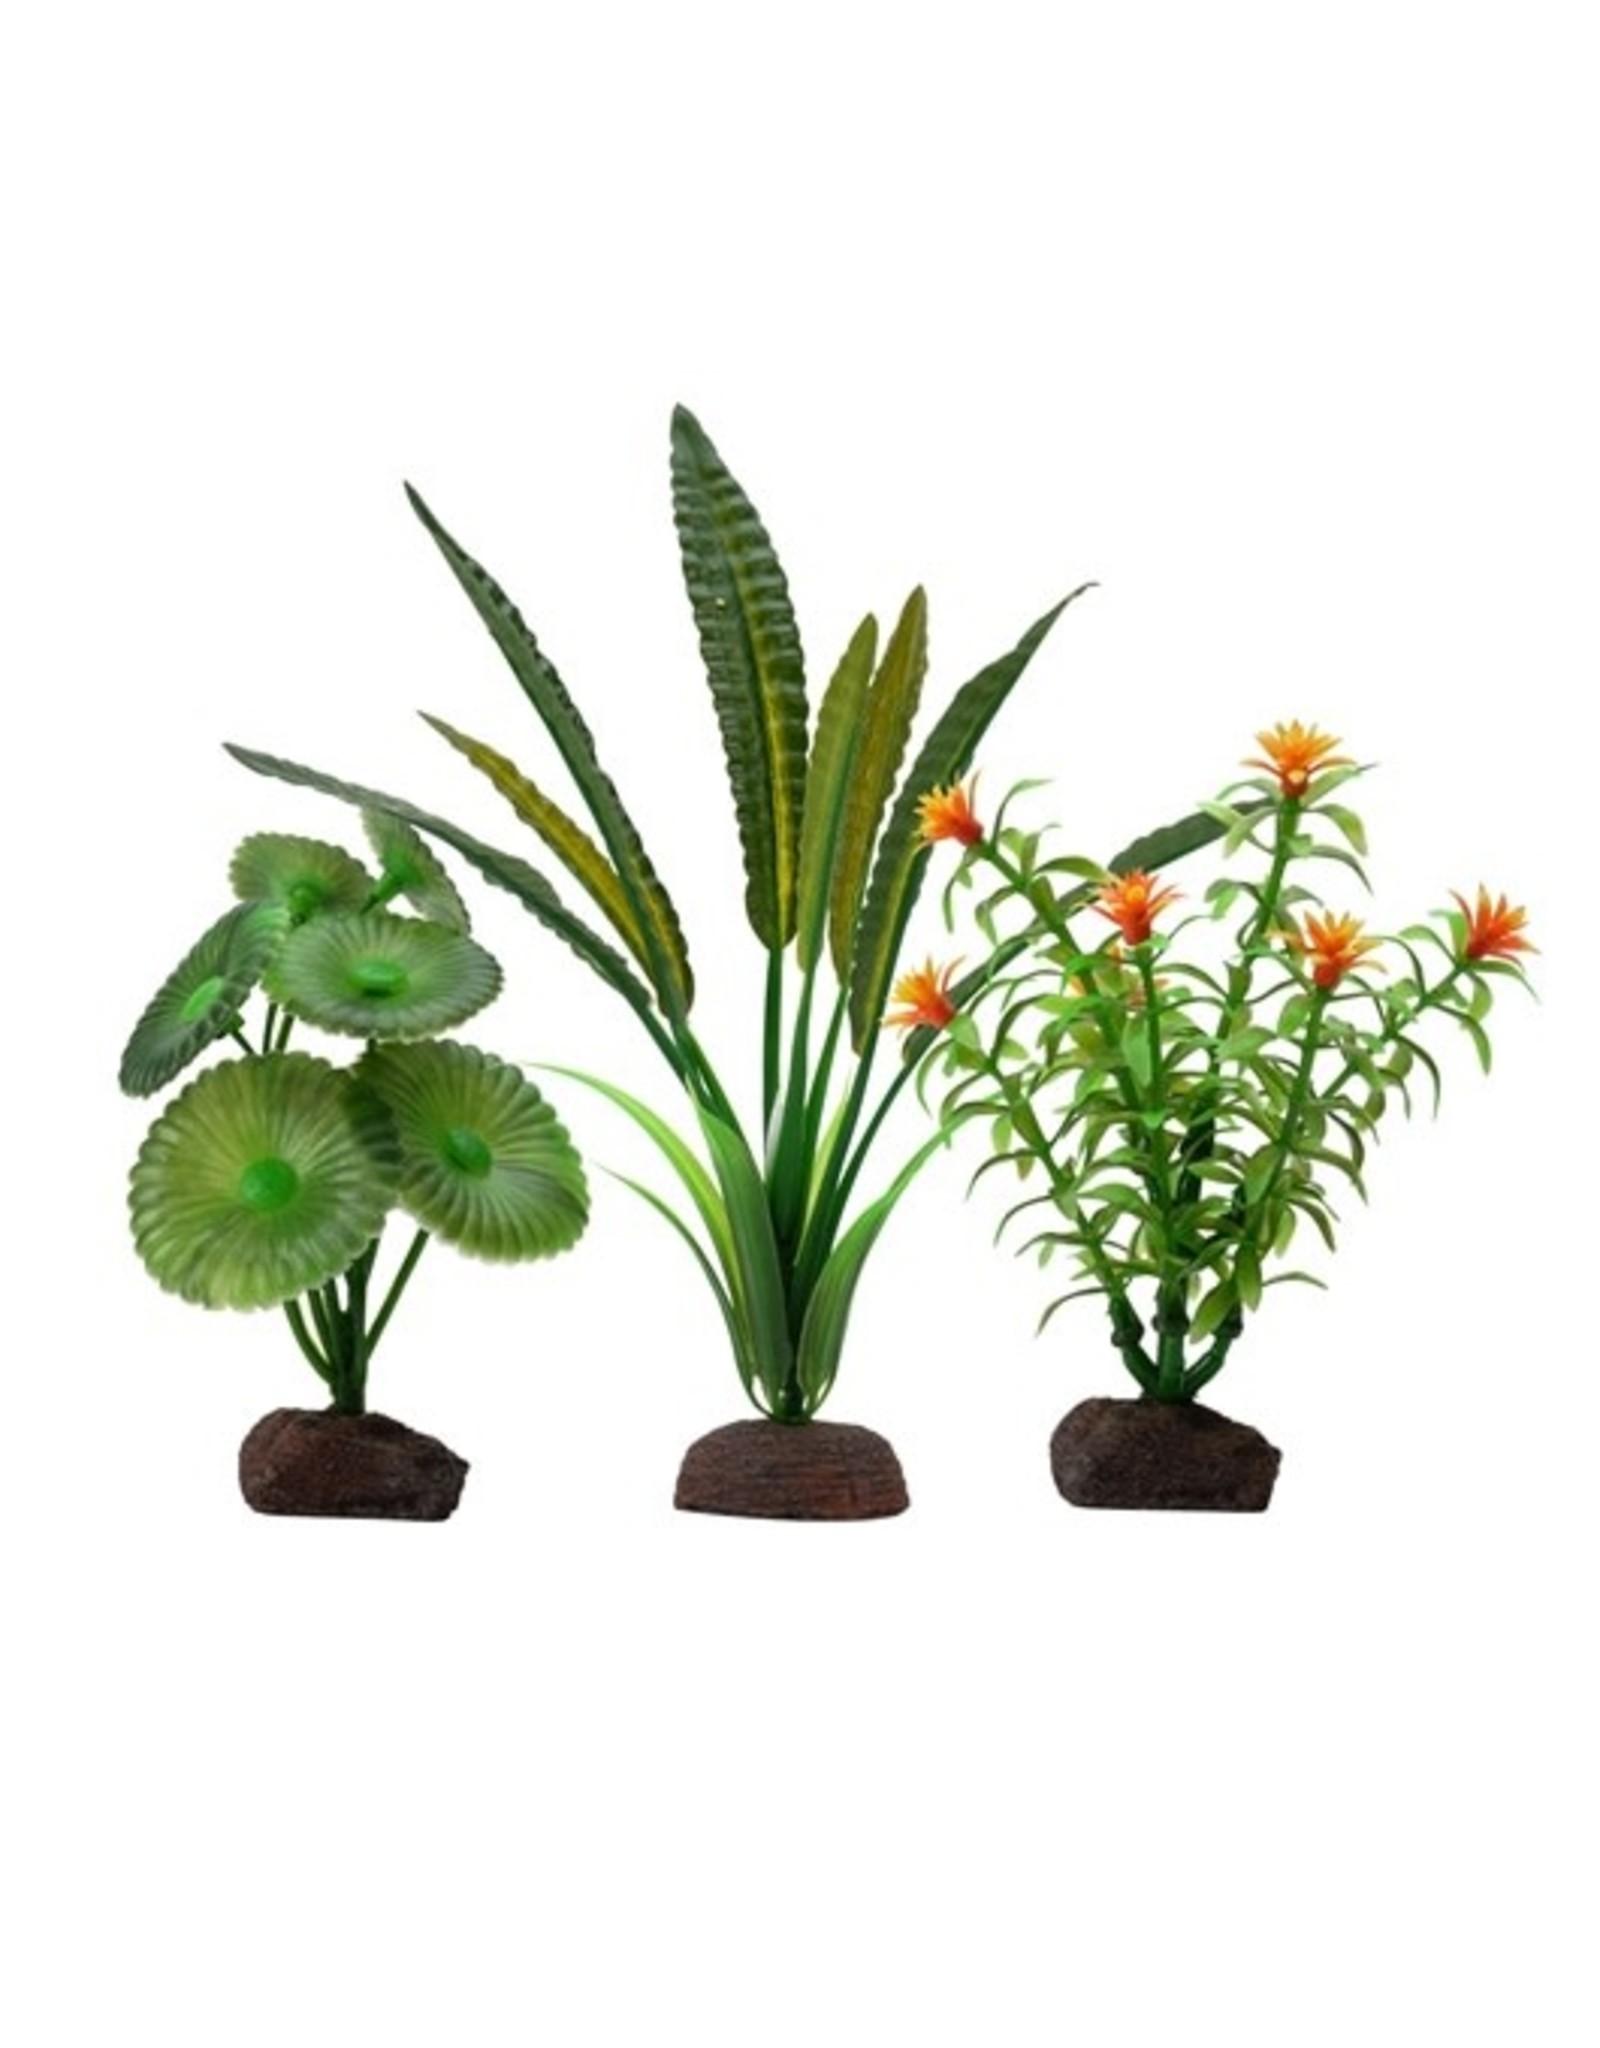 "Fluval Fluval Elodea Plant 3 Plant Set, 4-8"""